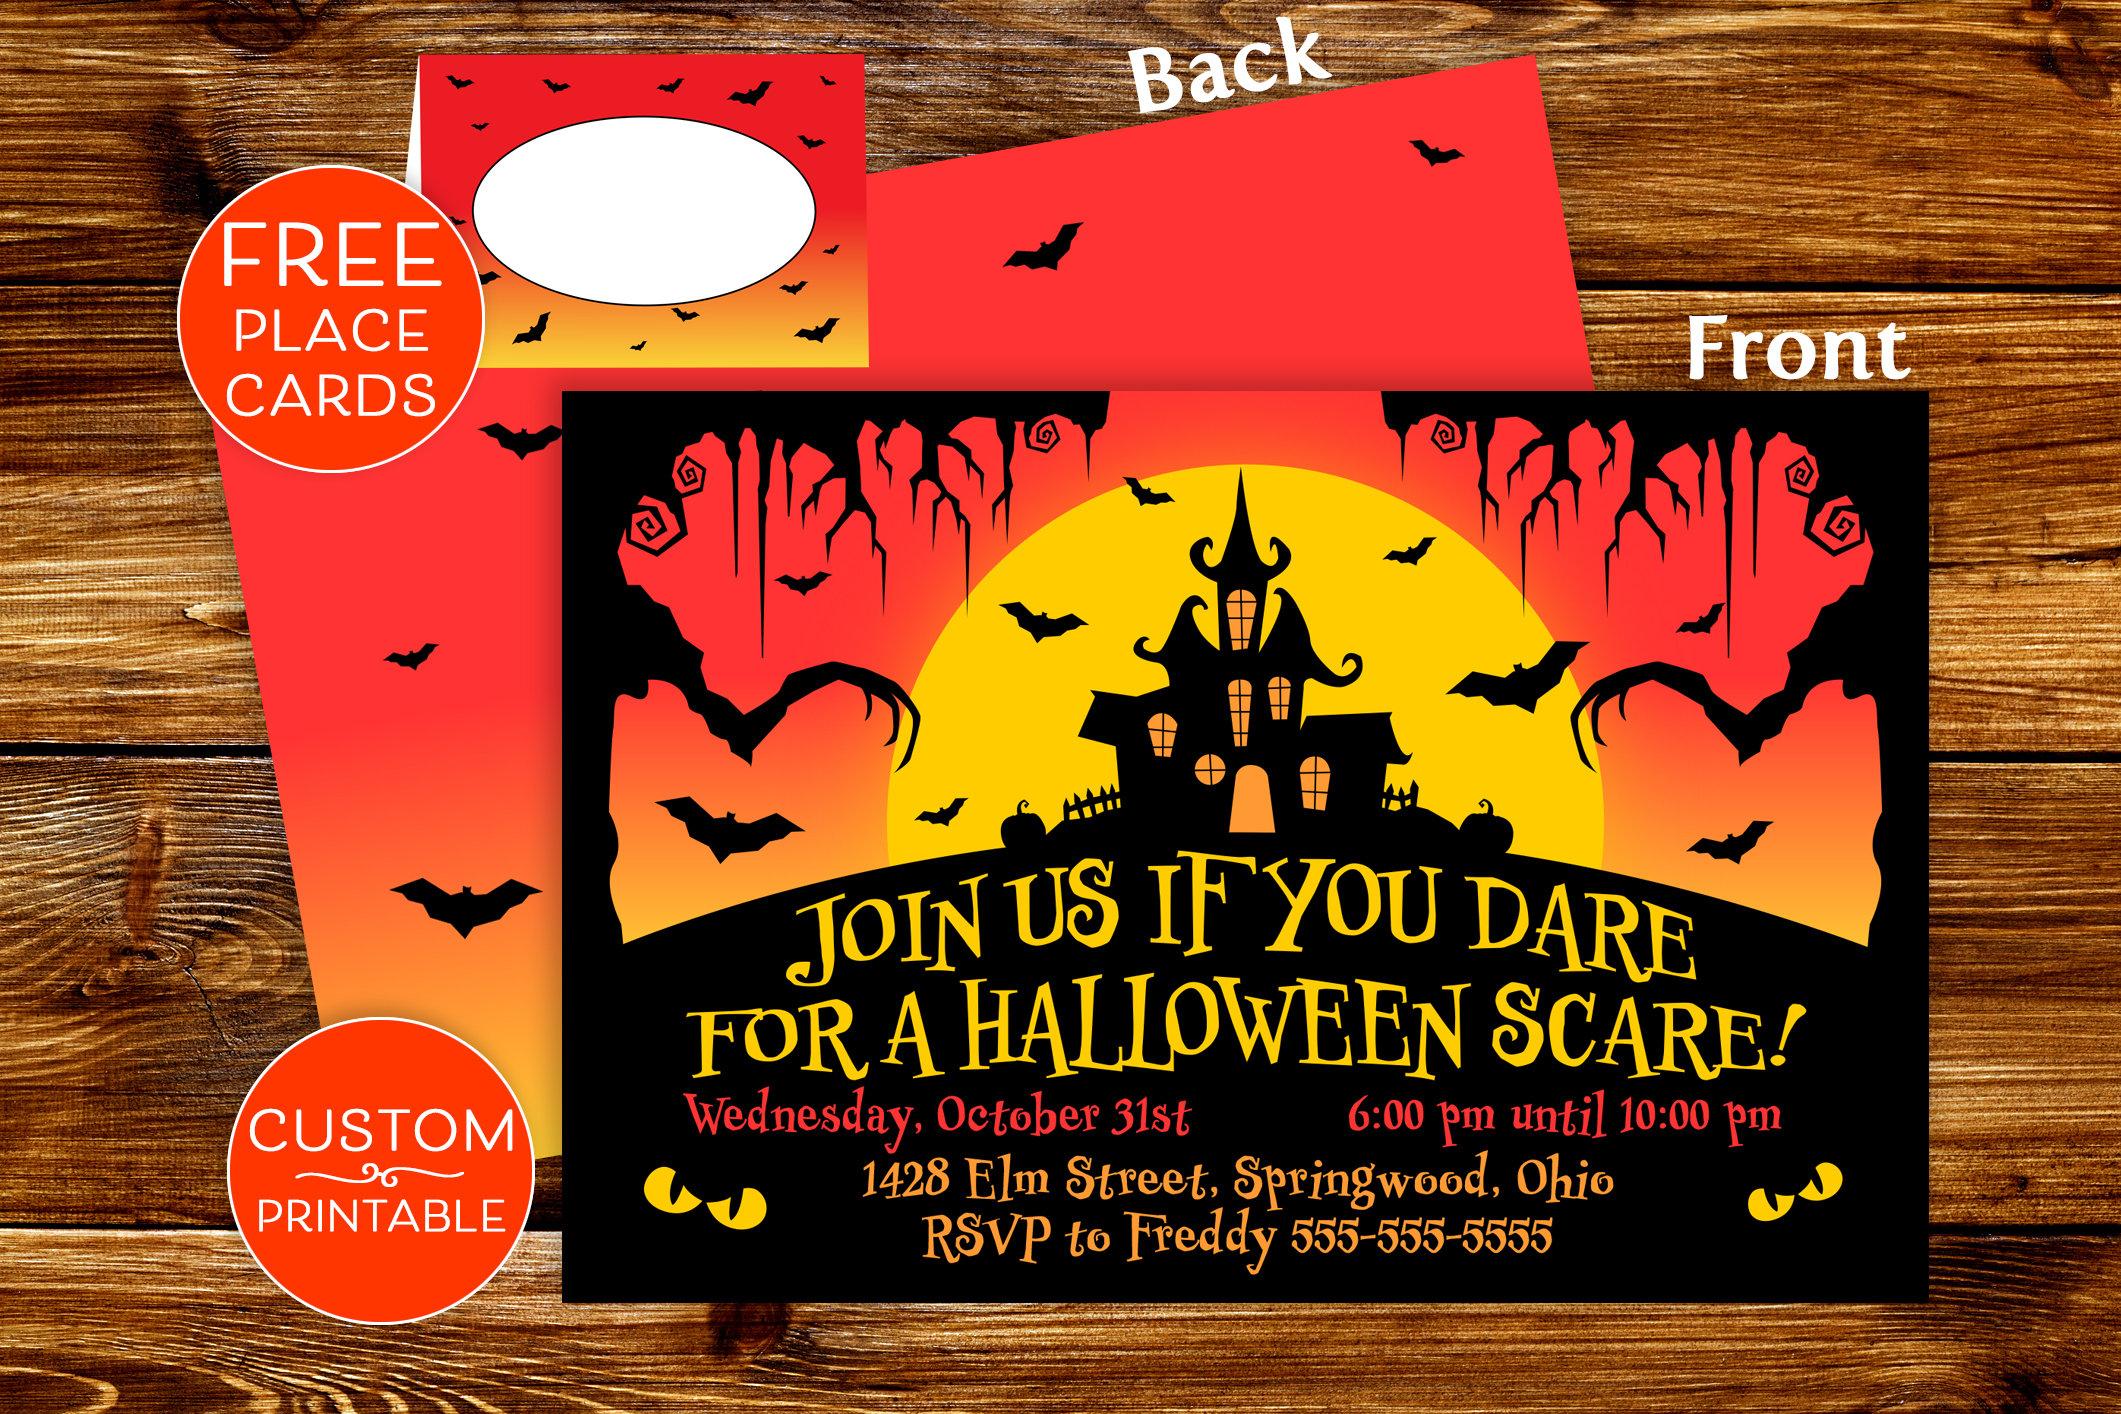 Printable Halloween Party Invitations Spooky Invite Custom   Etsy - Free Printable Halloween Place Cards